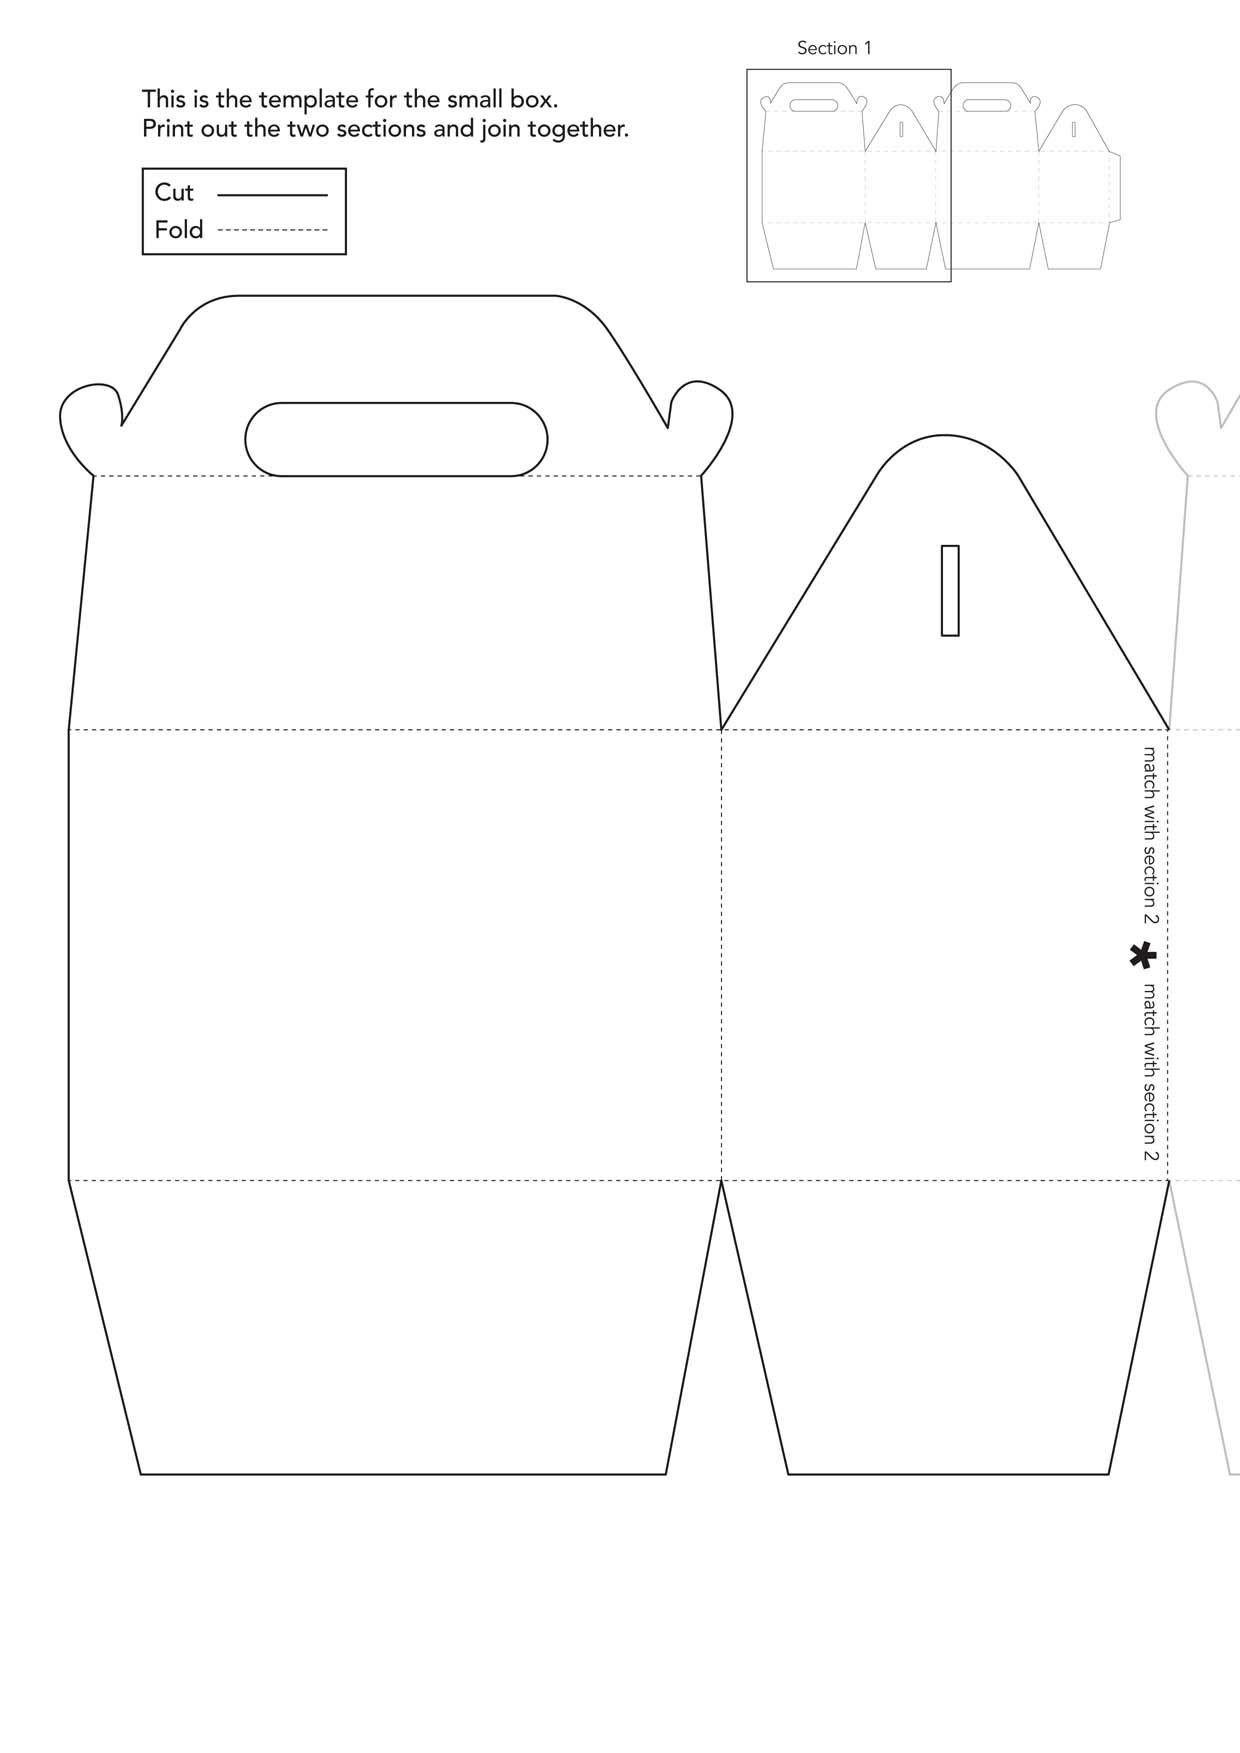 Cardboard Box Template Generator Pin De Julie Bowen Em Paper and Packaging